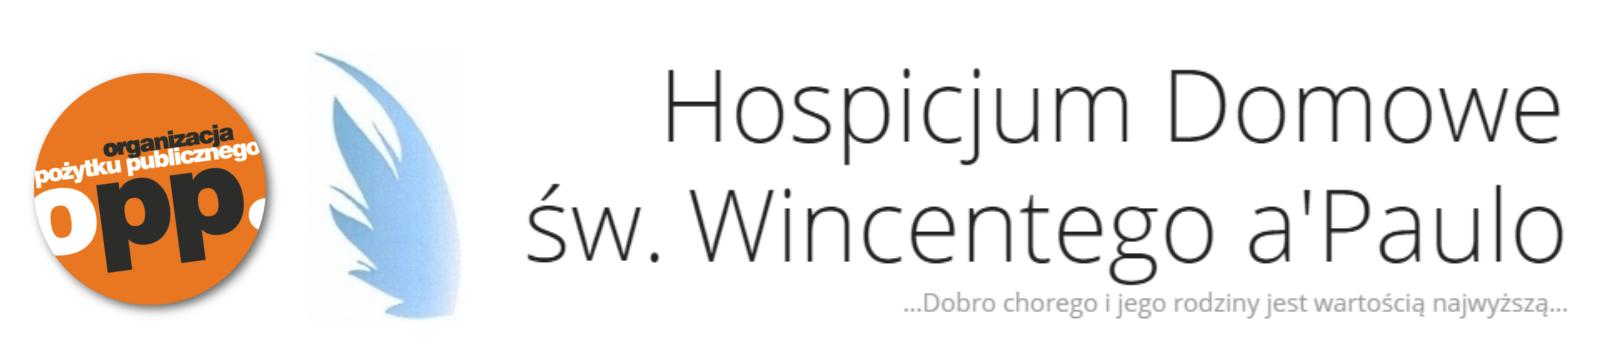 Hospicjum Domowe sw Wincentego A'Paulo